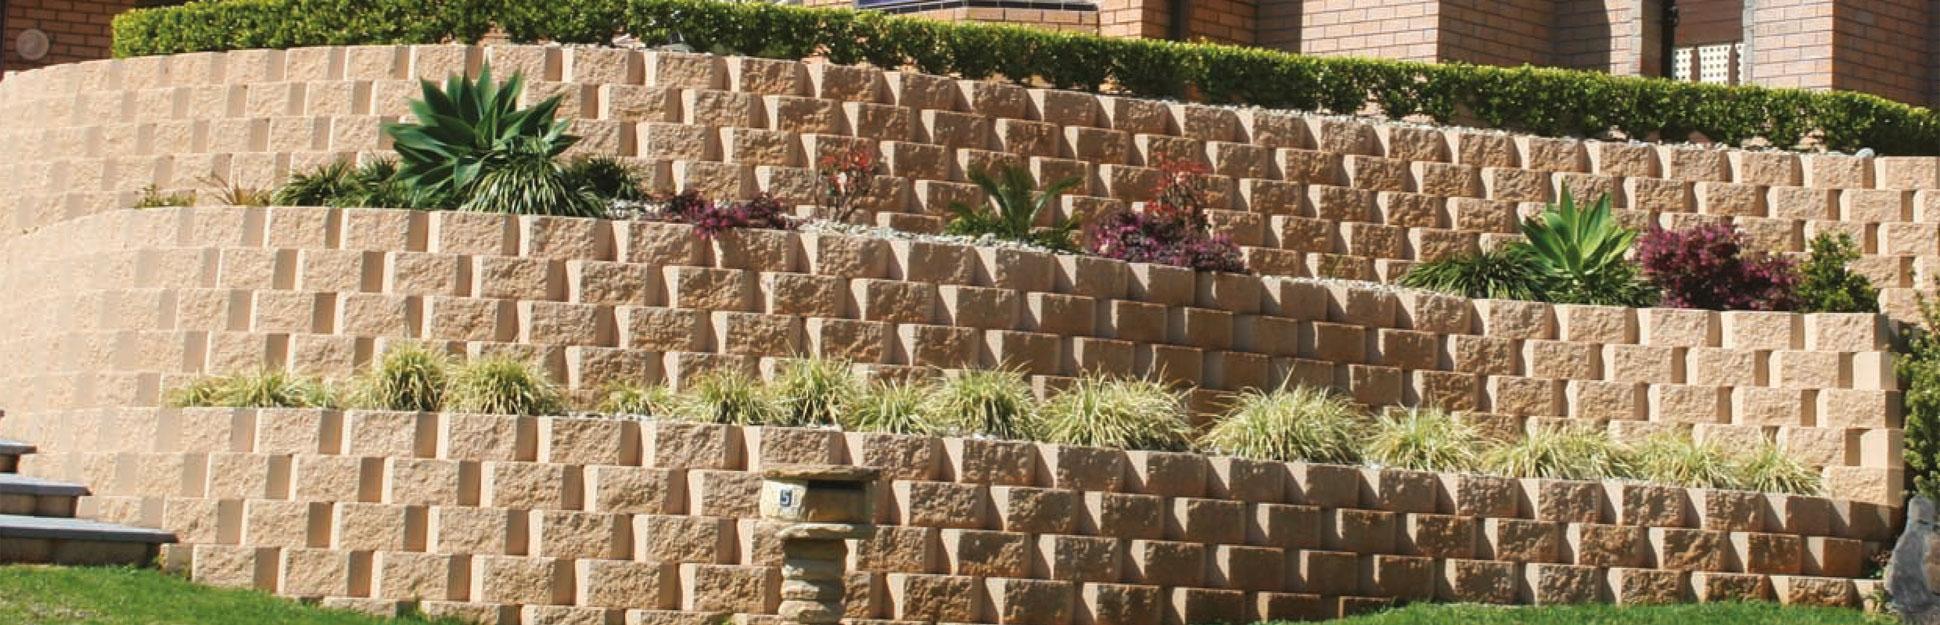 Norfolk concrete block retaining wall system